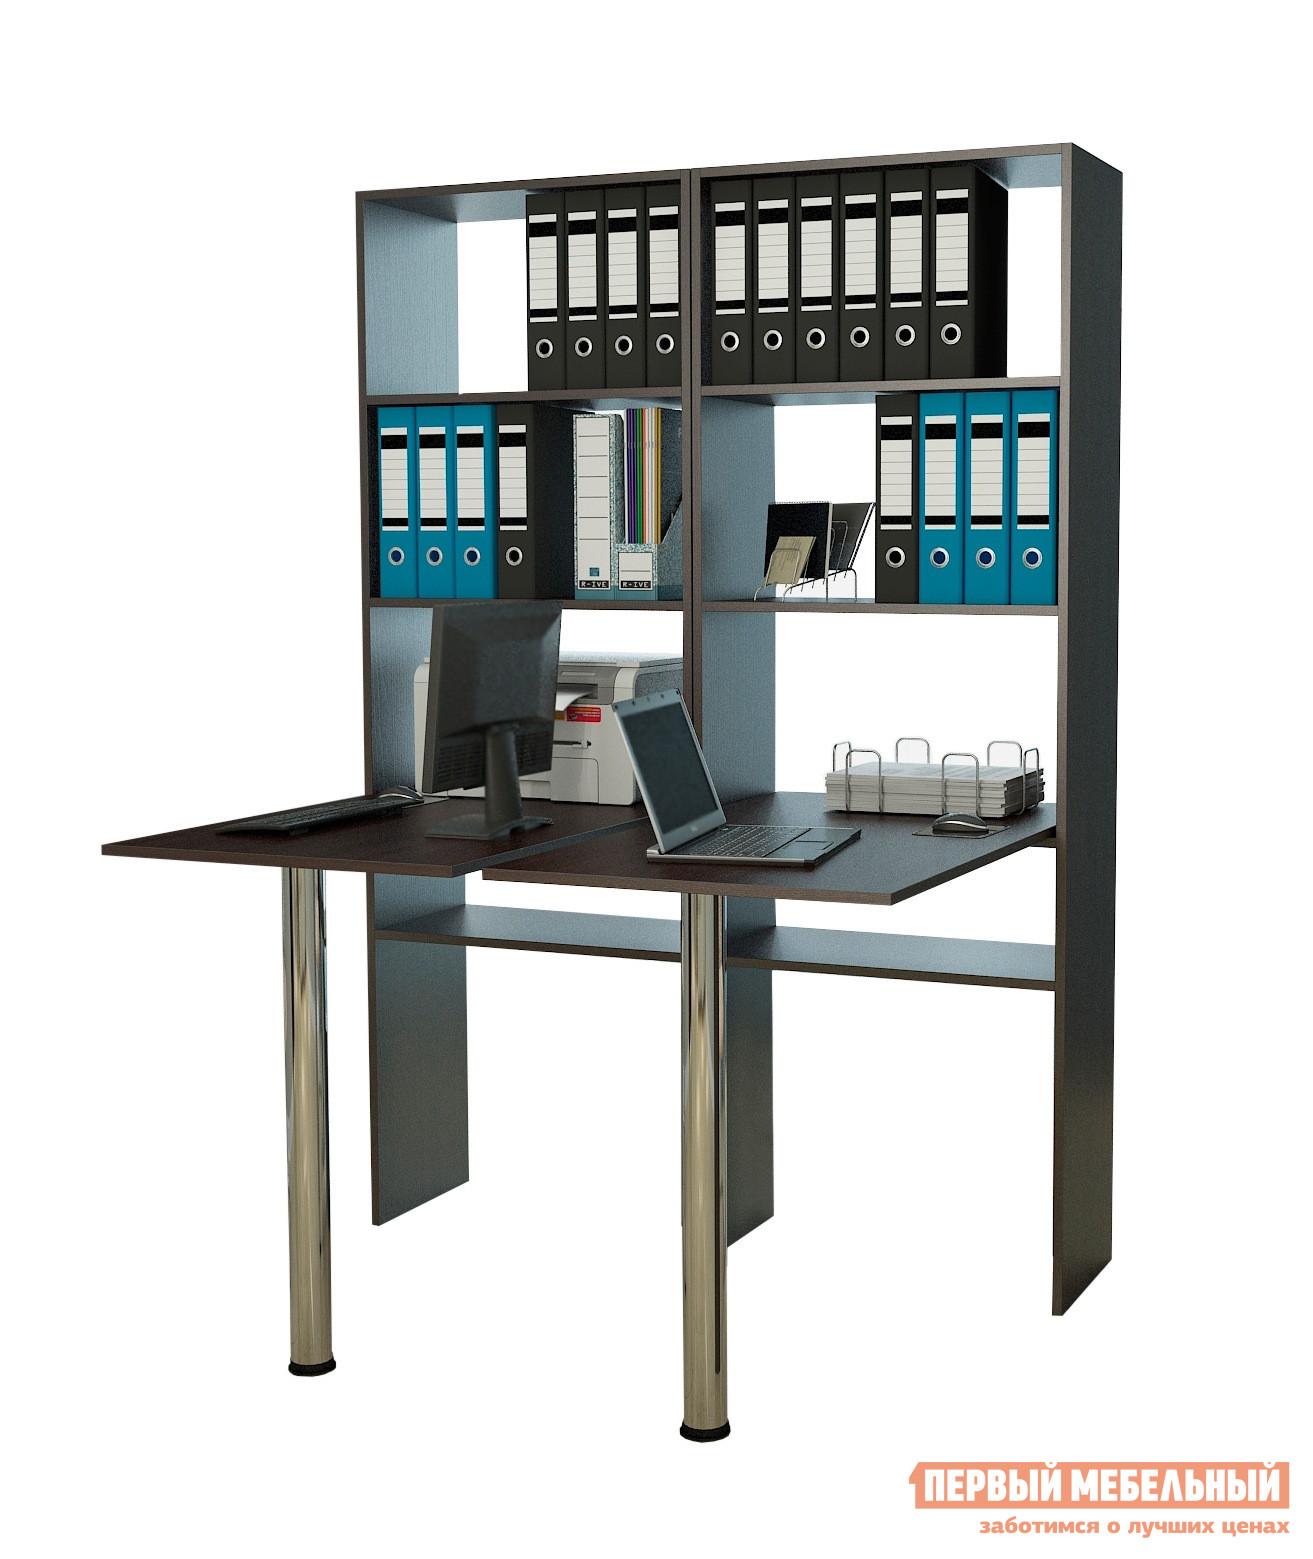 Компьютерный стол со стеллажом МФ Мастер 2 шт. Рикс-4 + 2 шт. Рикс-6 компьютерный стол со стеллажом мф мастер 2 шт рикс 4 2 шт рикс 6